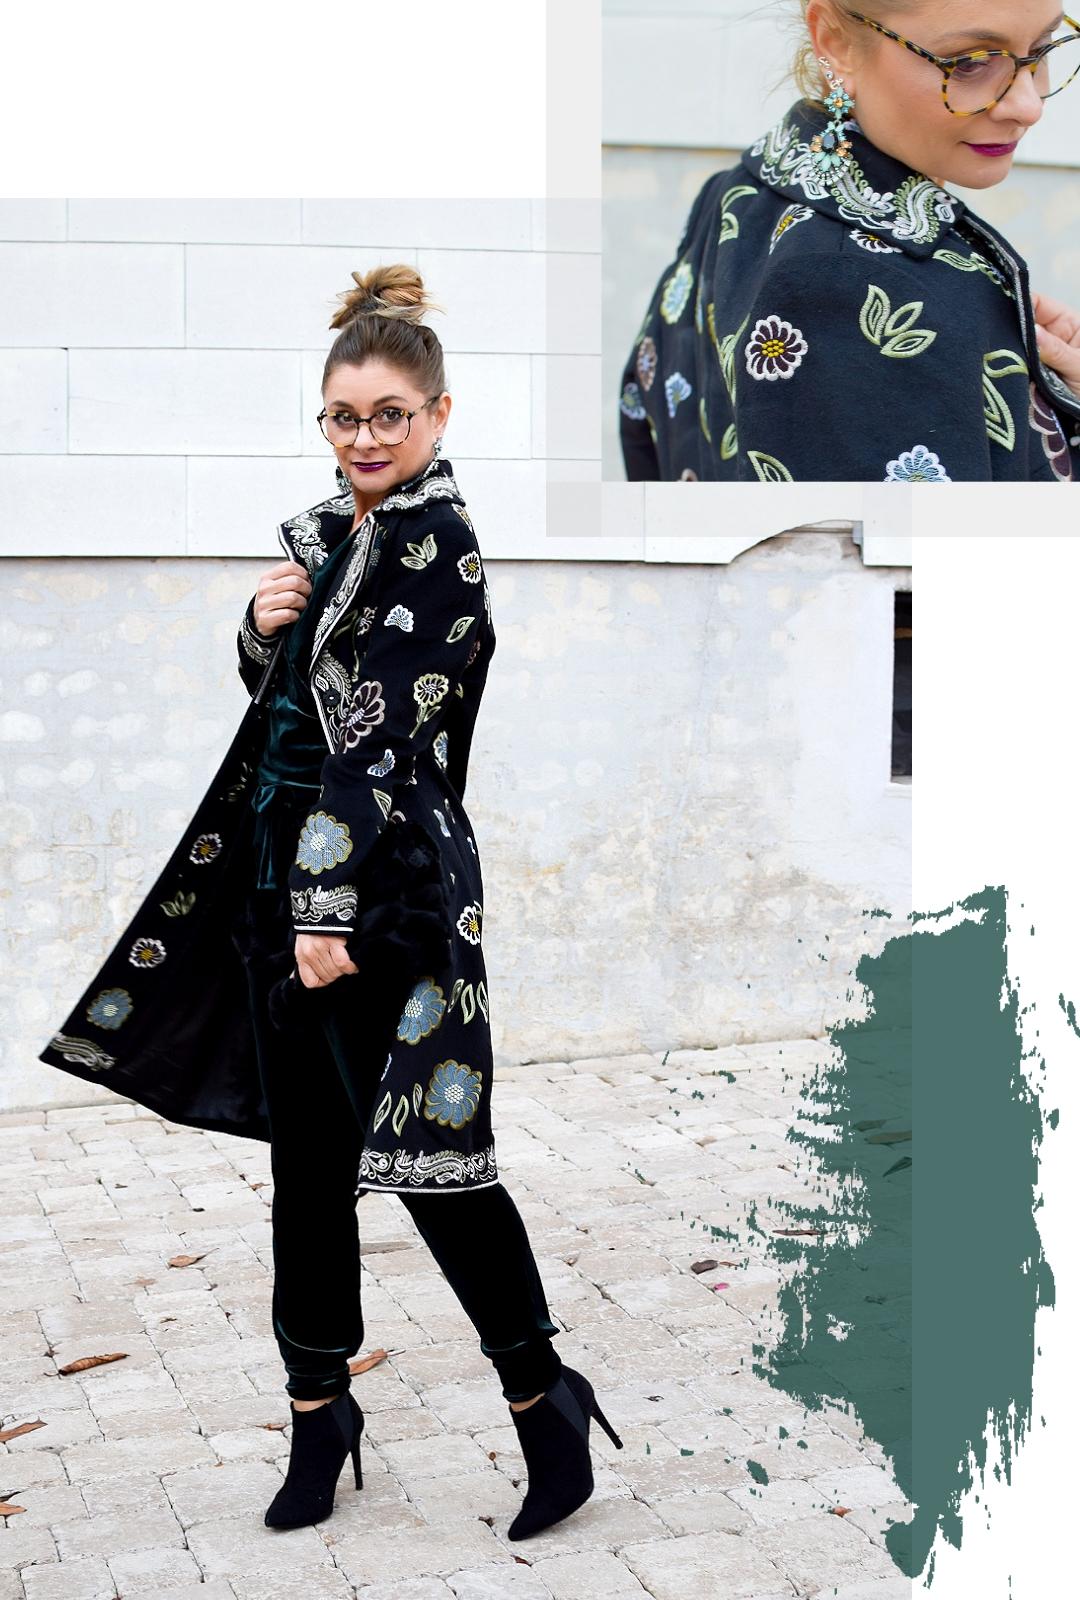 was trage ich am besten zu Silvester, Silvester Outfit Modeblogger